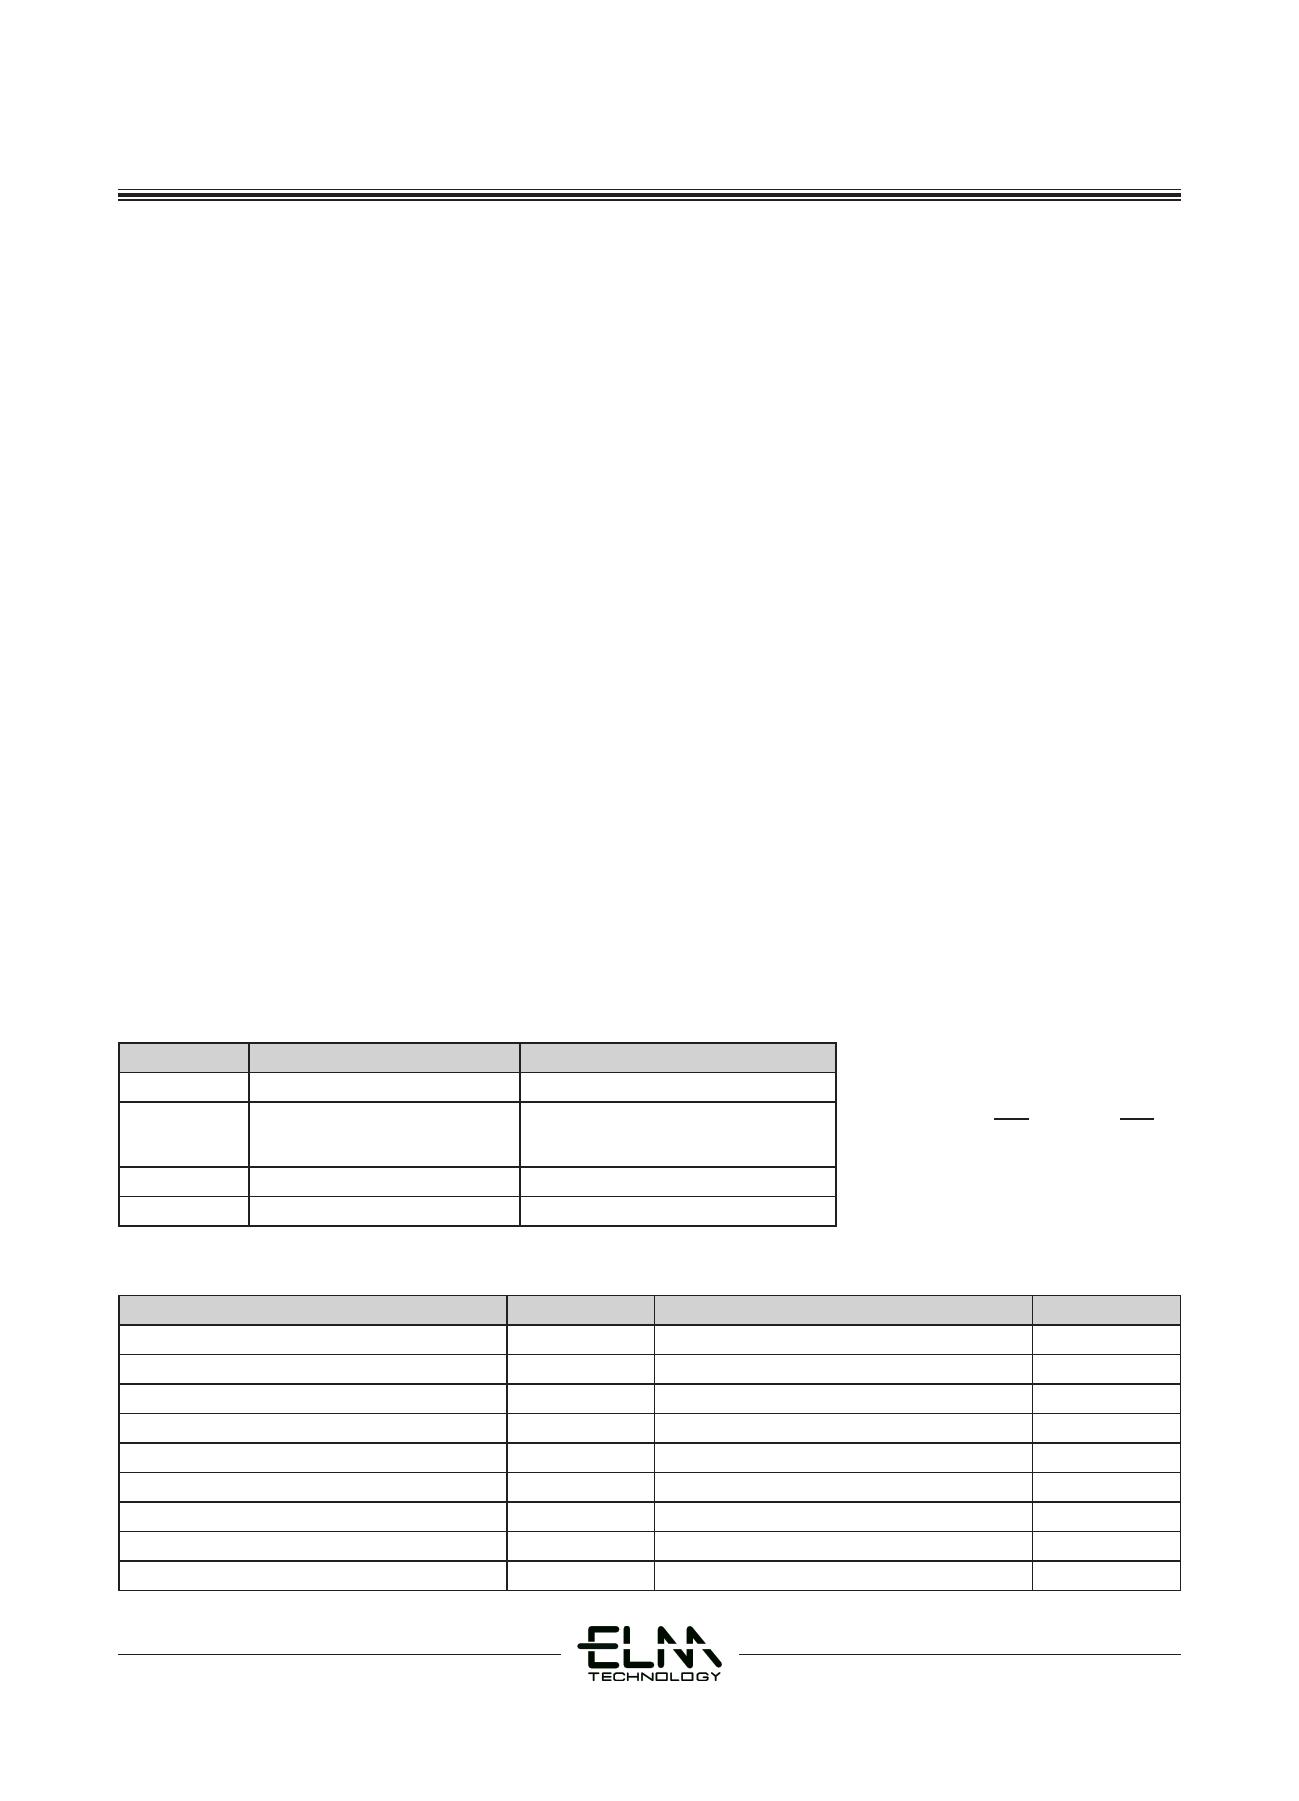 ELM7SH02MB Datasheet, ELM7SH02MB PDF,ピン配置, 機能